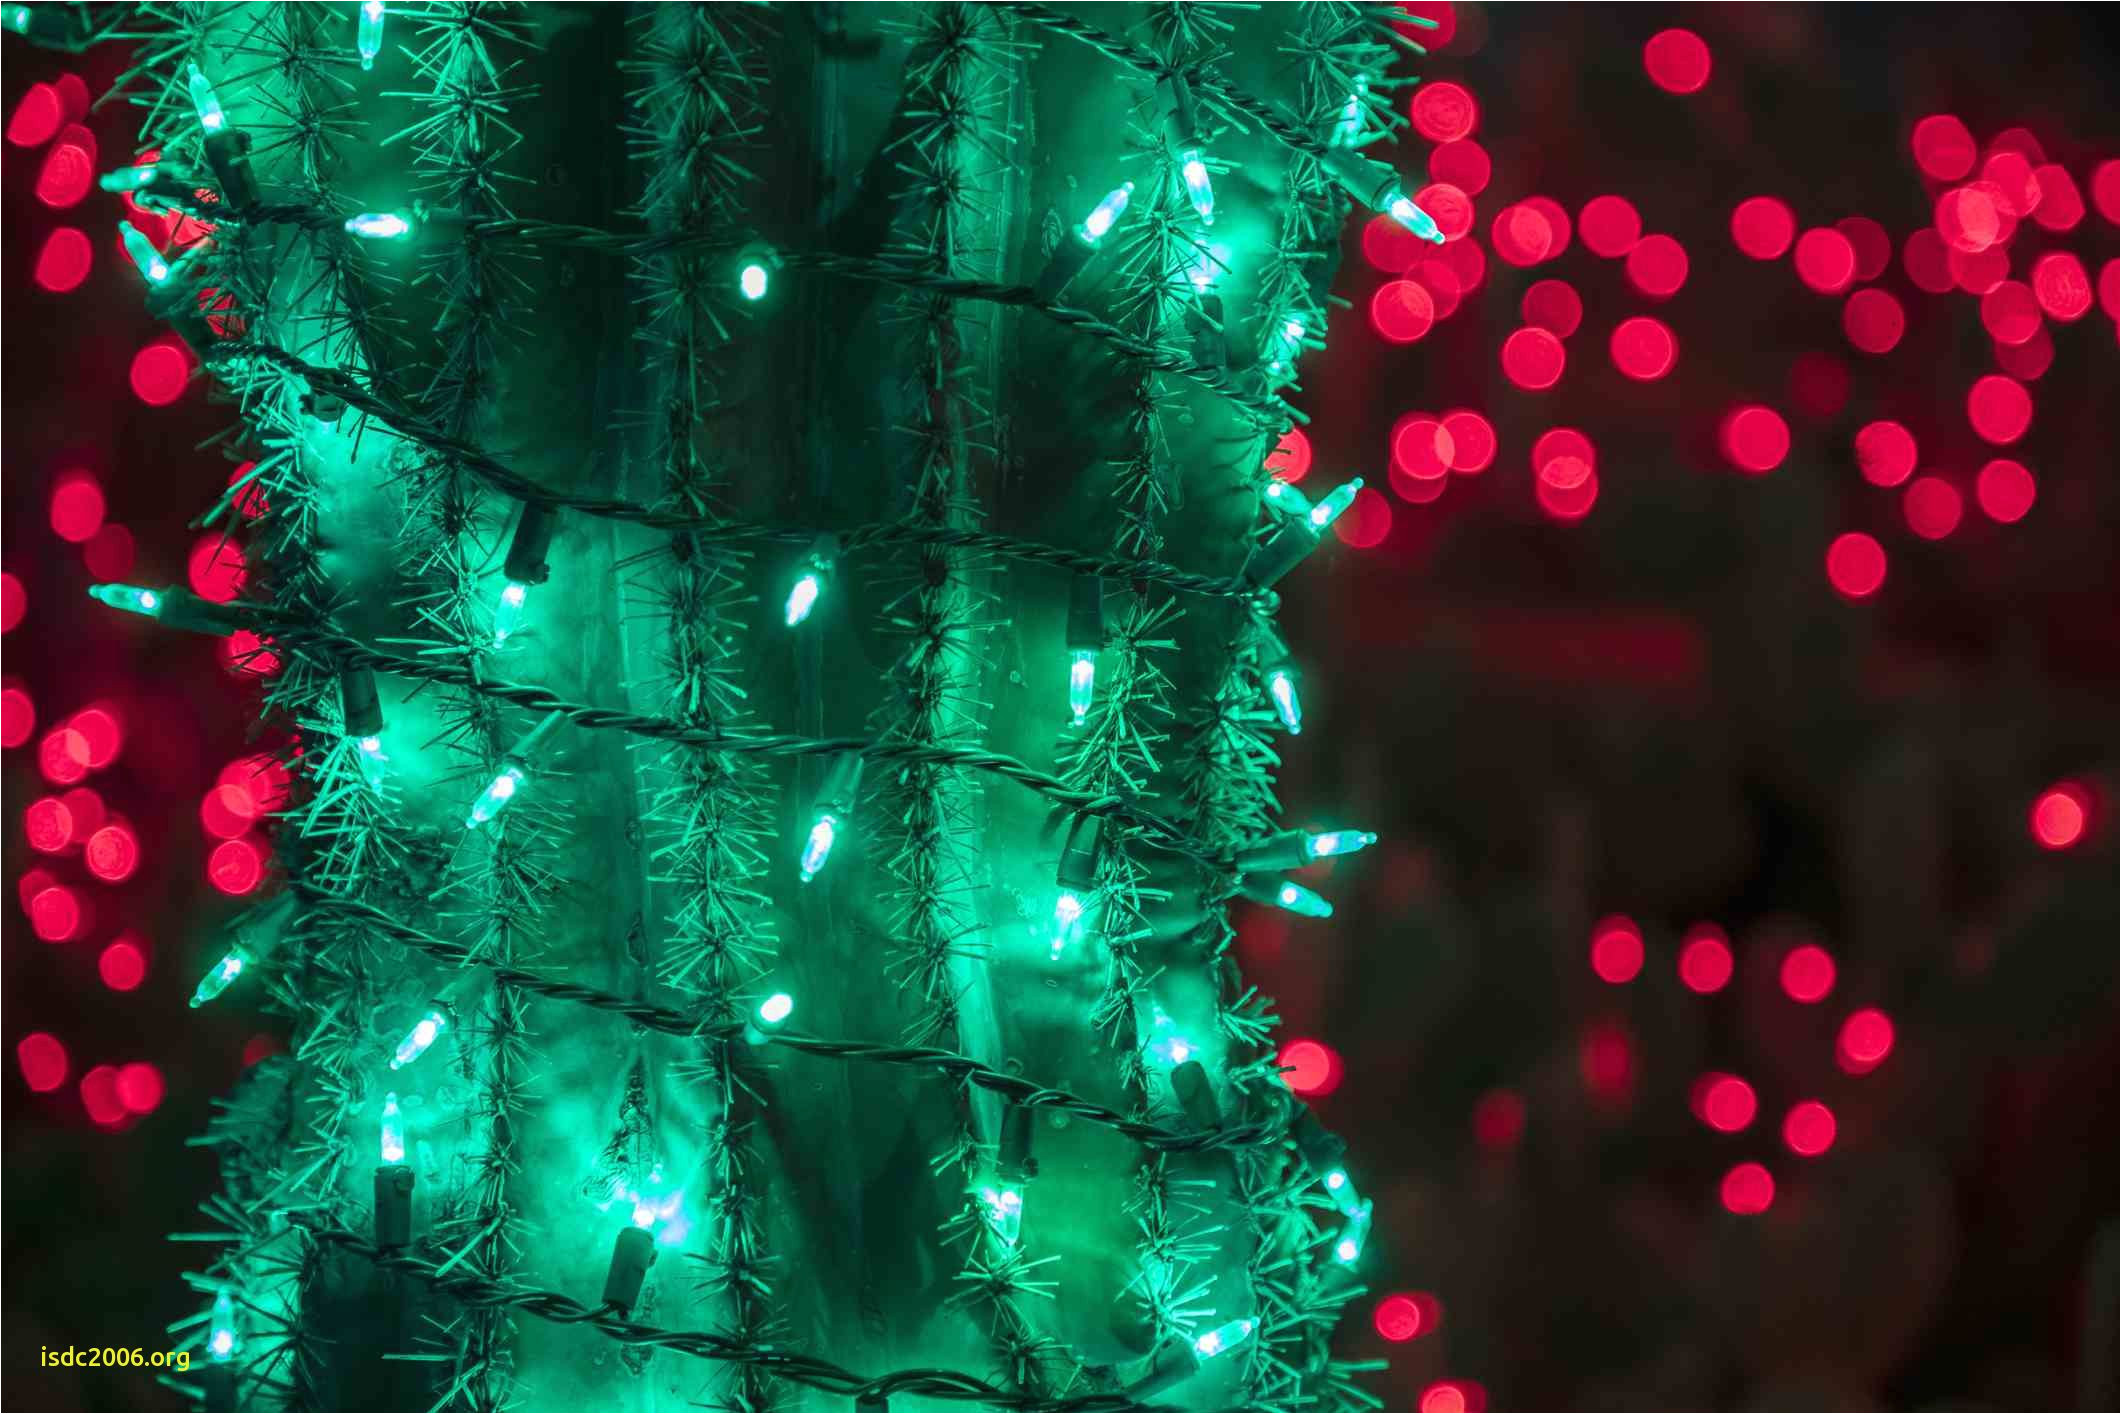 atlanta botanical garden christmaslightincactus 5a802fc3ff1b f1cbeb